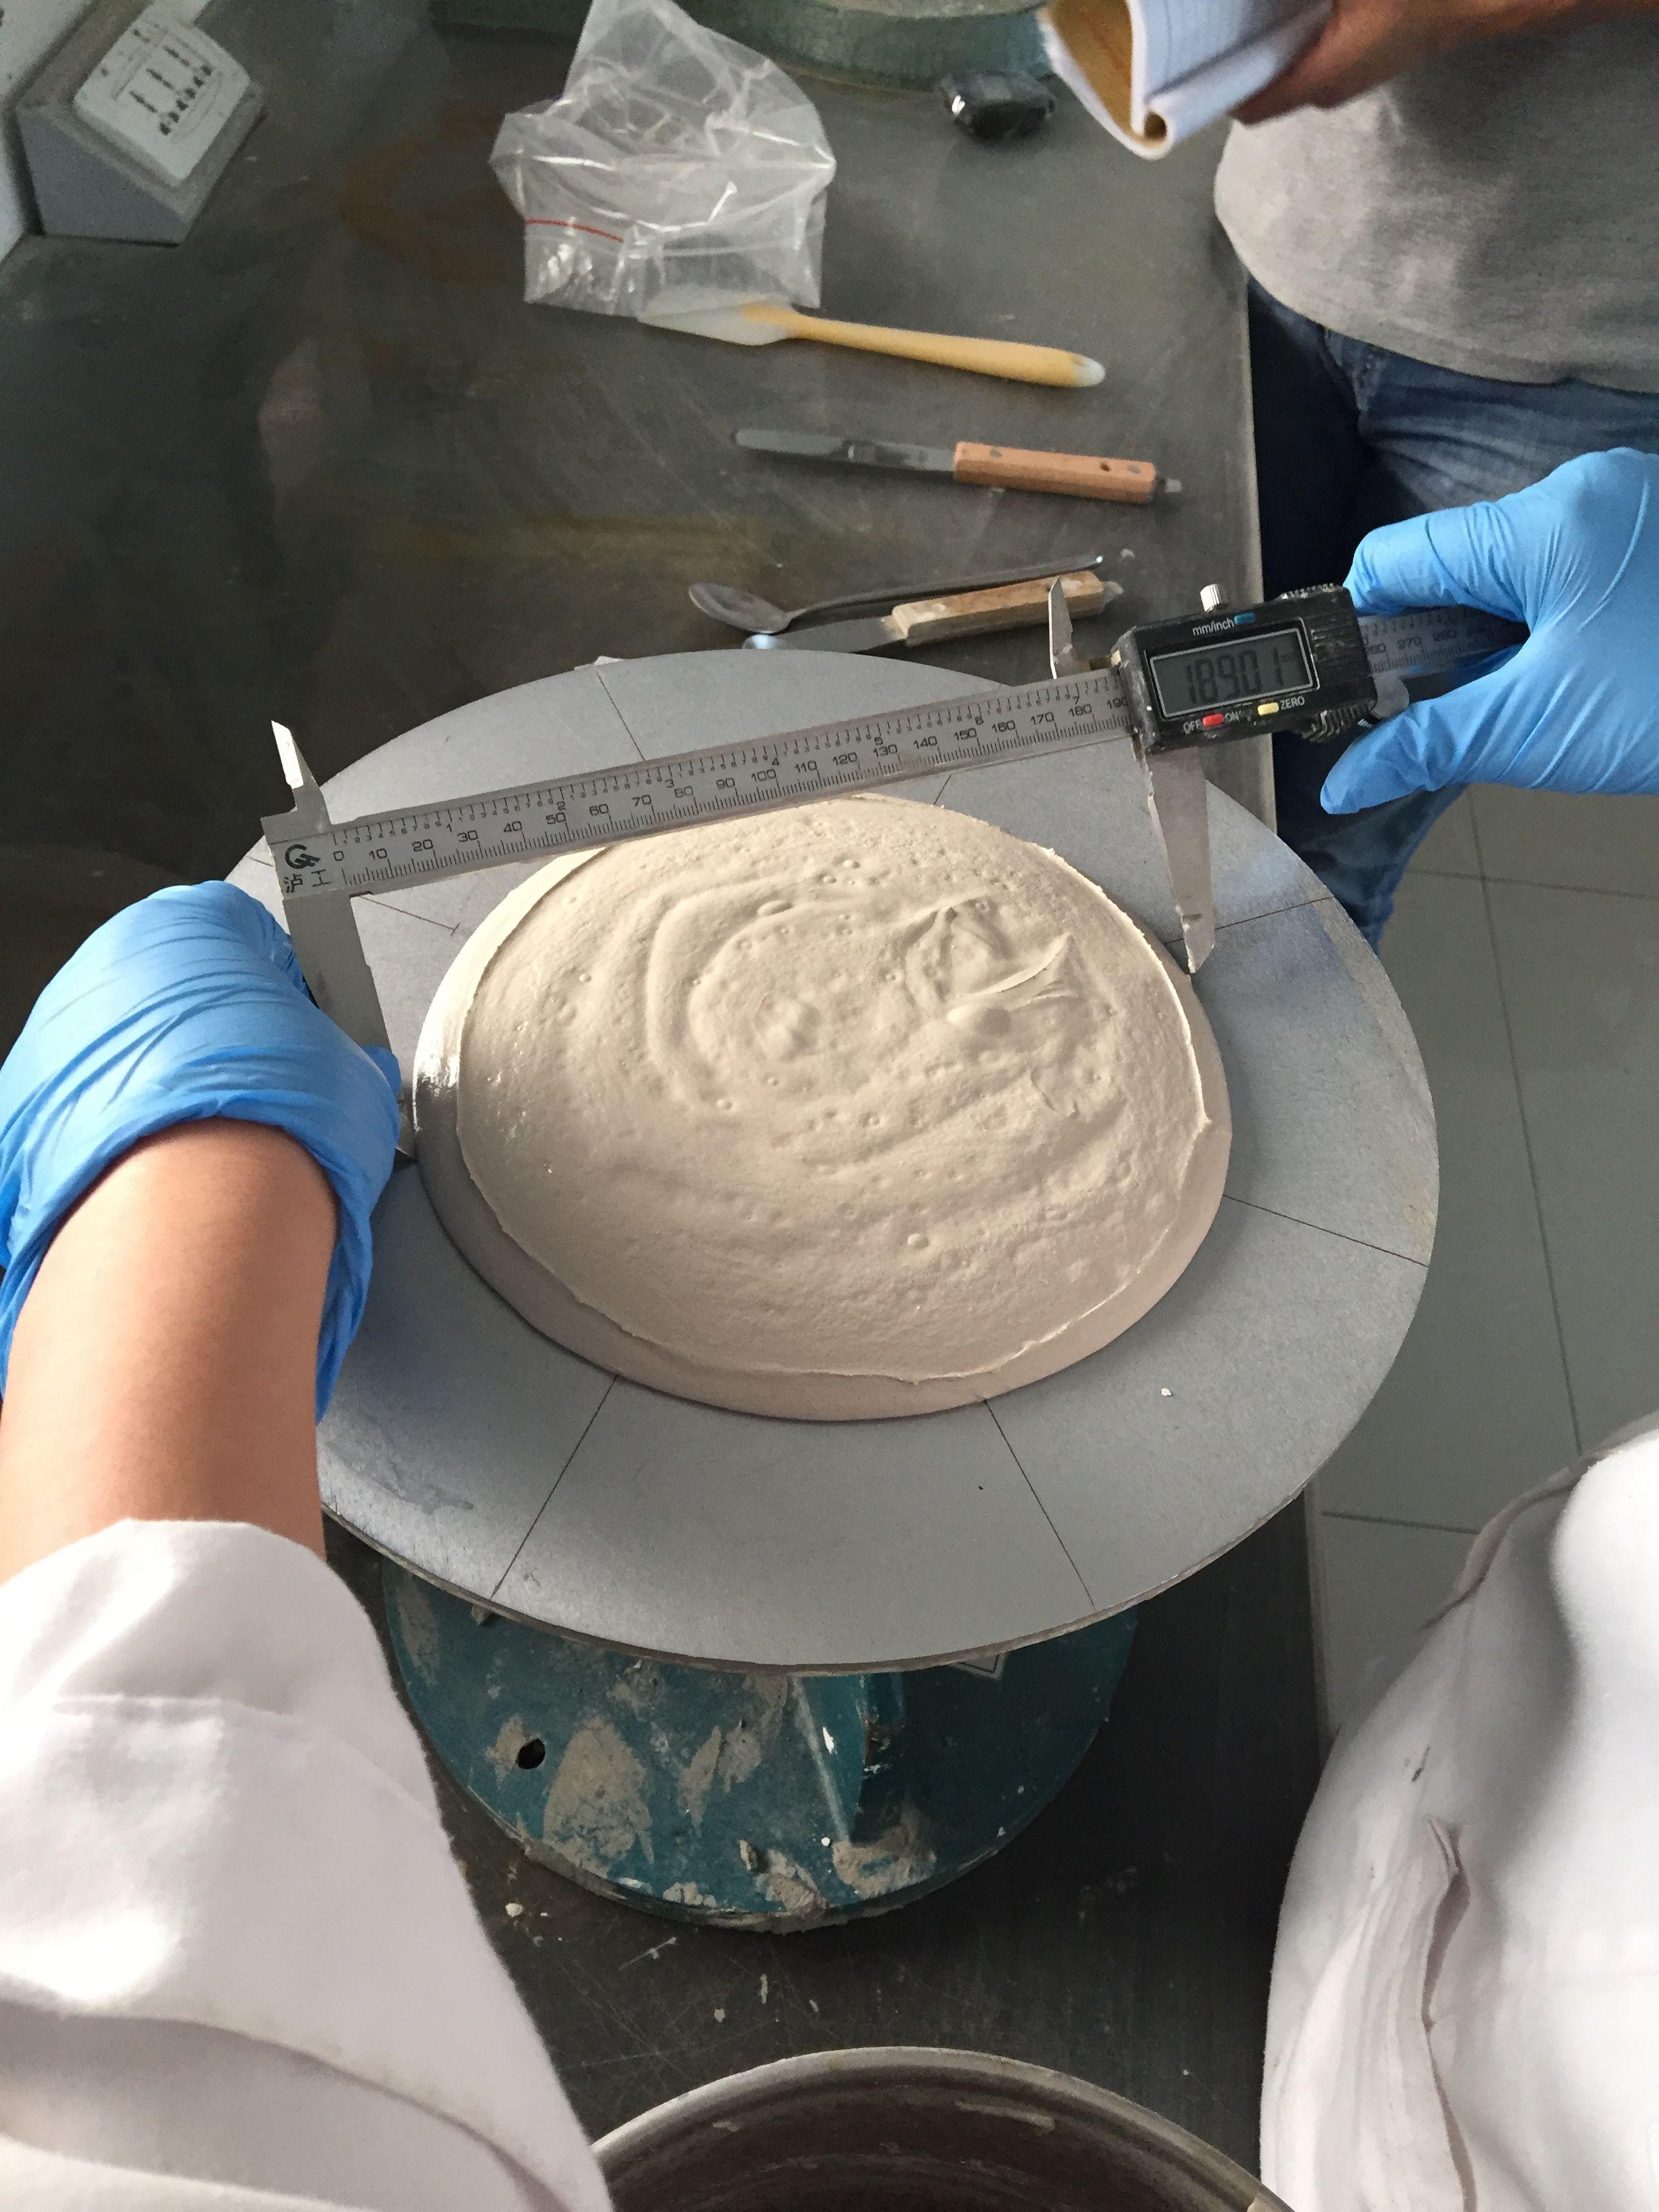 Hydroxypropyl Methylcellulose | HPMC | Gypsum Finishing Plaster